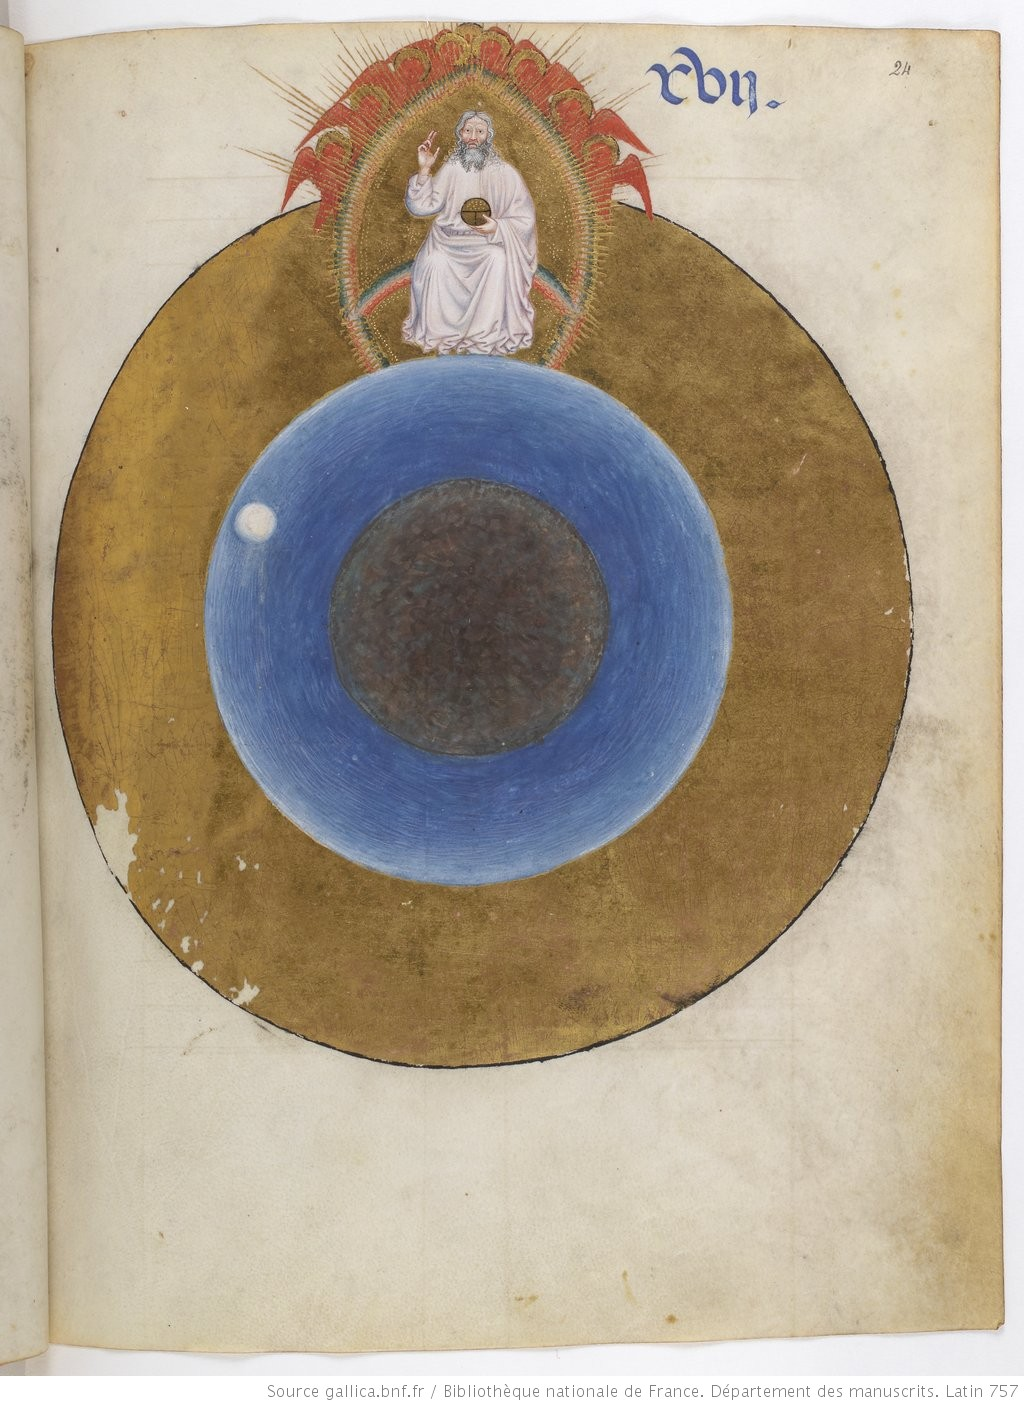 1 Dimanche Missel a l'usage des freres mineurs, Lombardie, 1388, Gallica BNF ms. lat. 757, fol. 24r